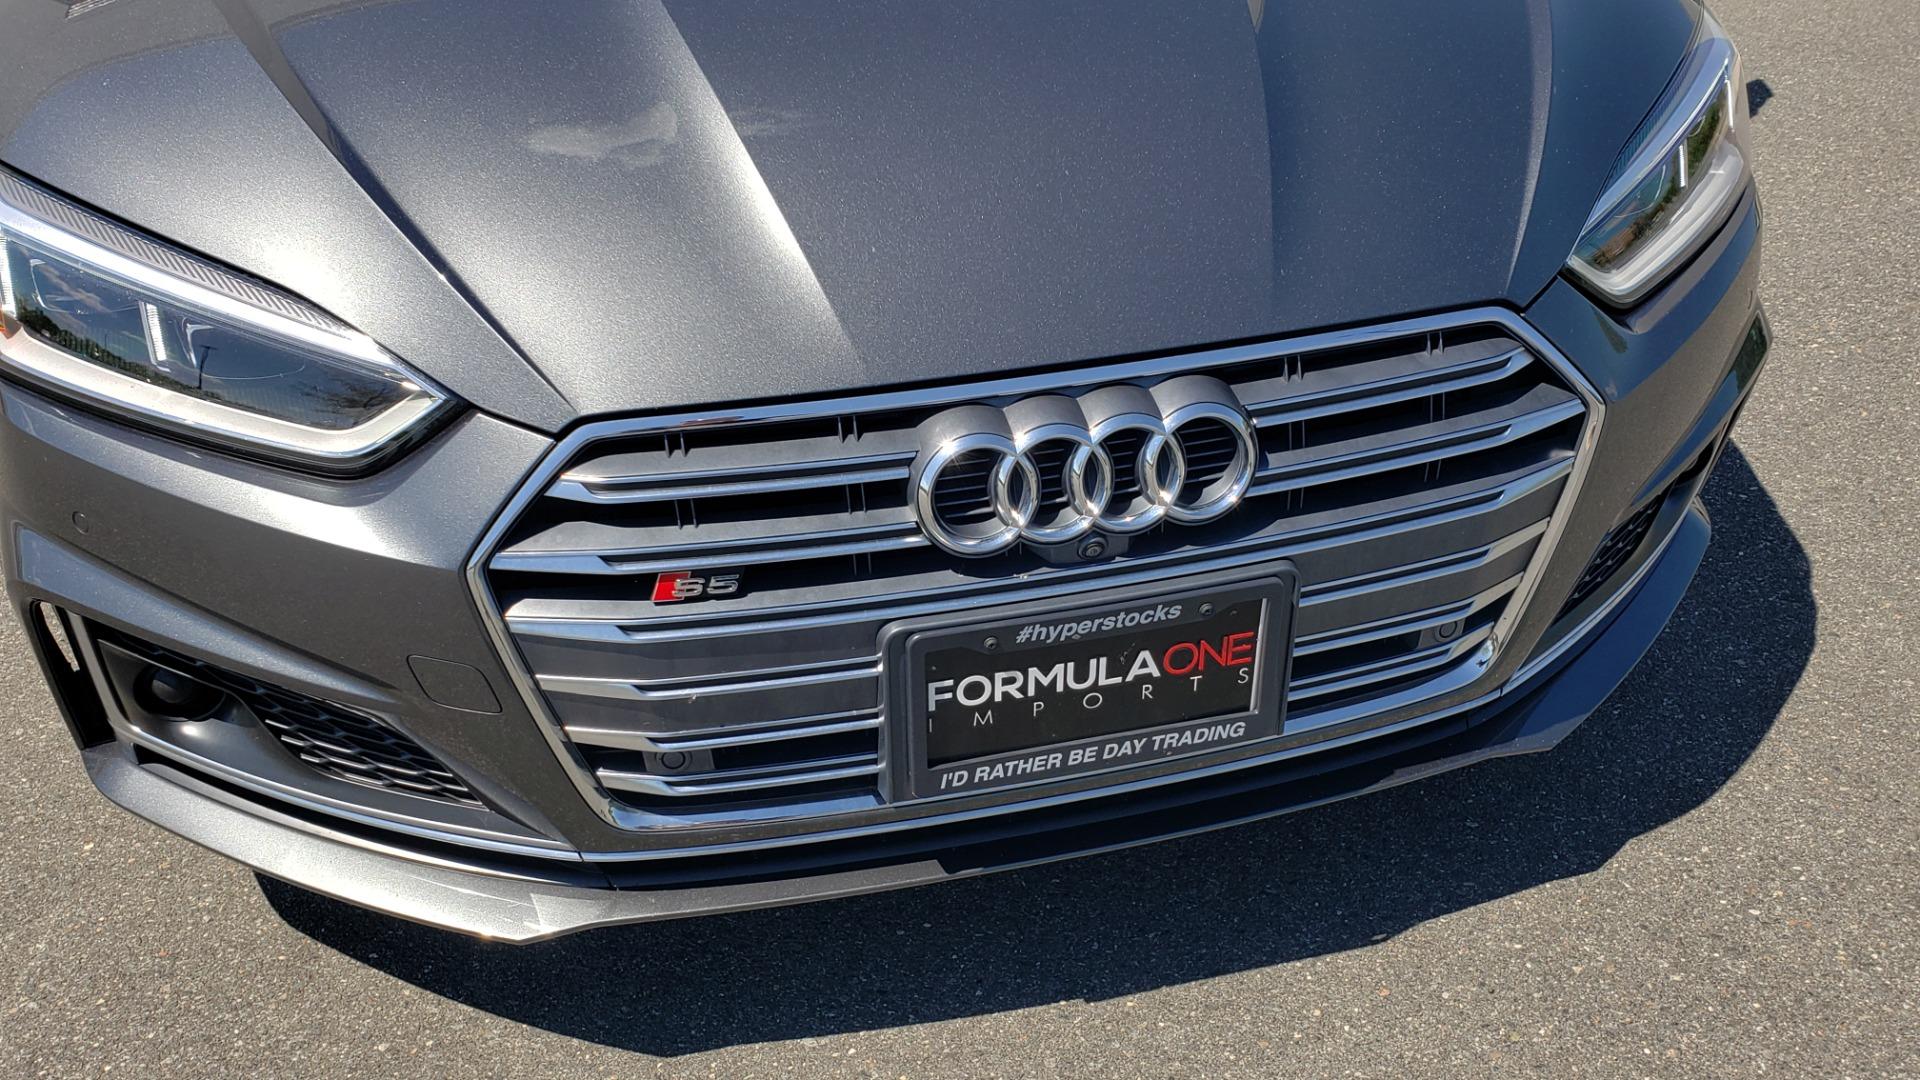 Used 2018 Audi S5 SPORTBACK PRESTIGE S-SPORT / NAV / SUNROOF / HUD / B&O SND / REARVIEW for sale $48,995 at Formula Imports in Charlotte NC 28227 24